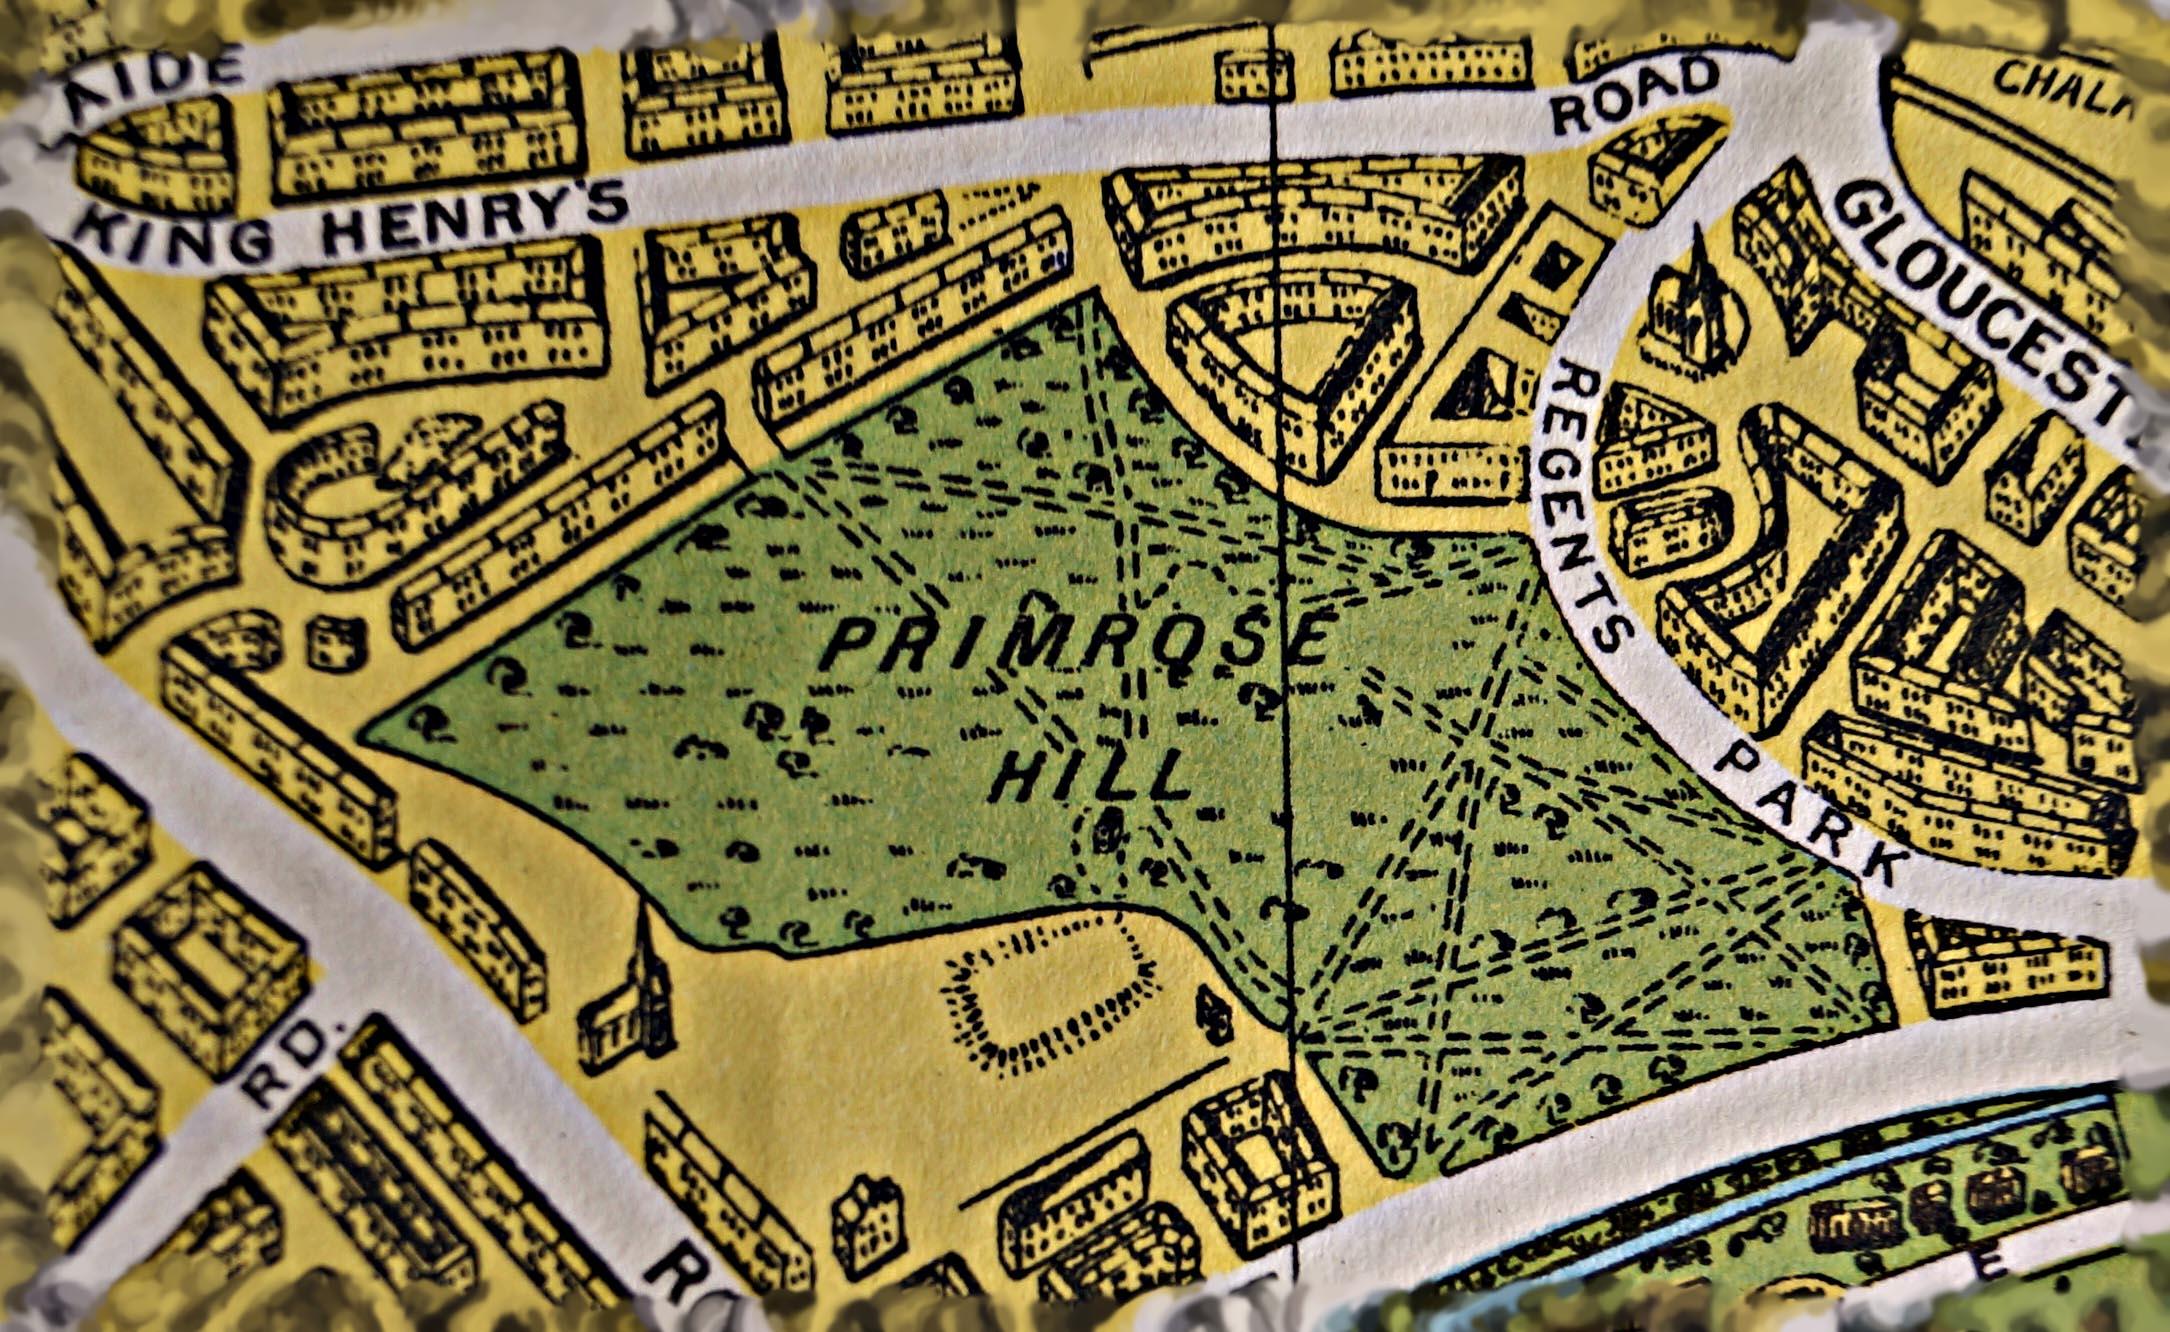 primrose hill new years eve london